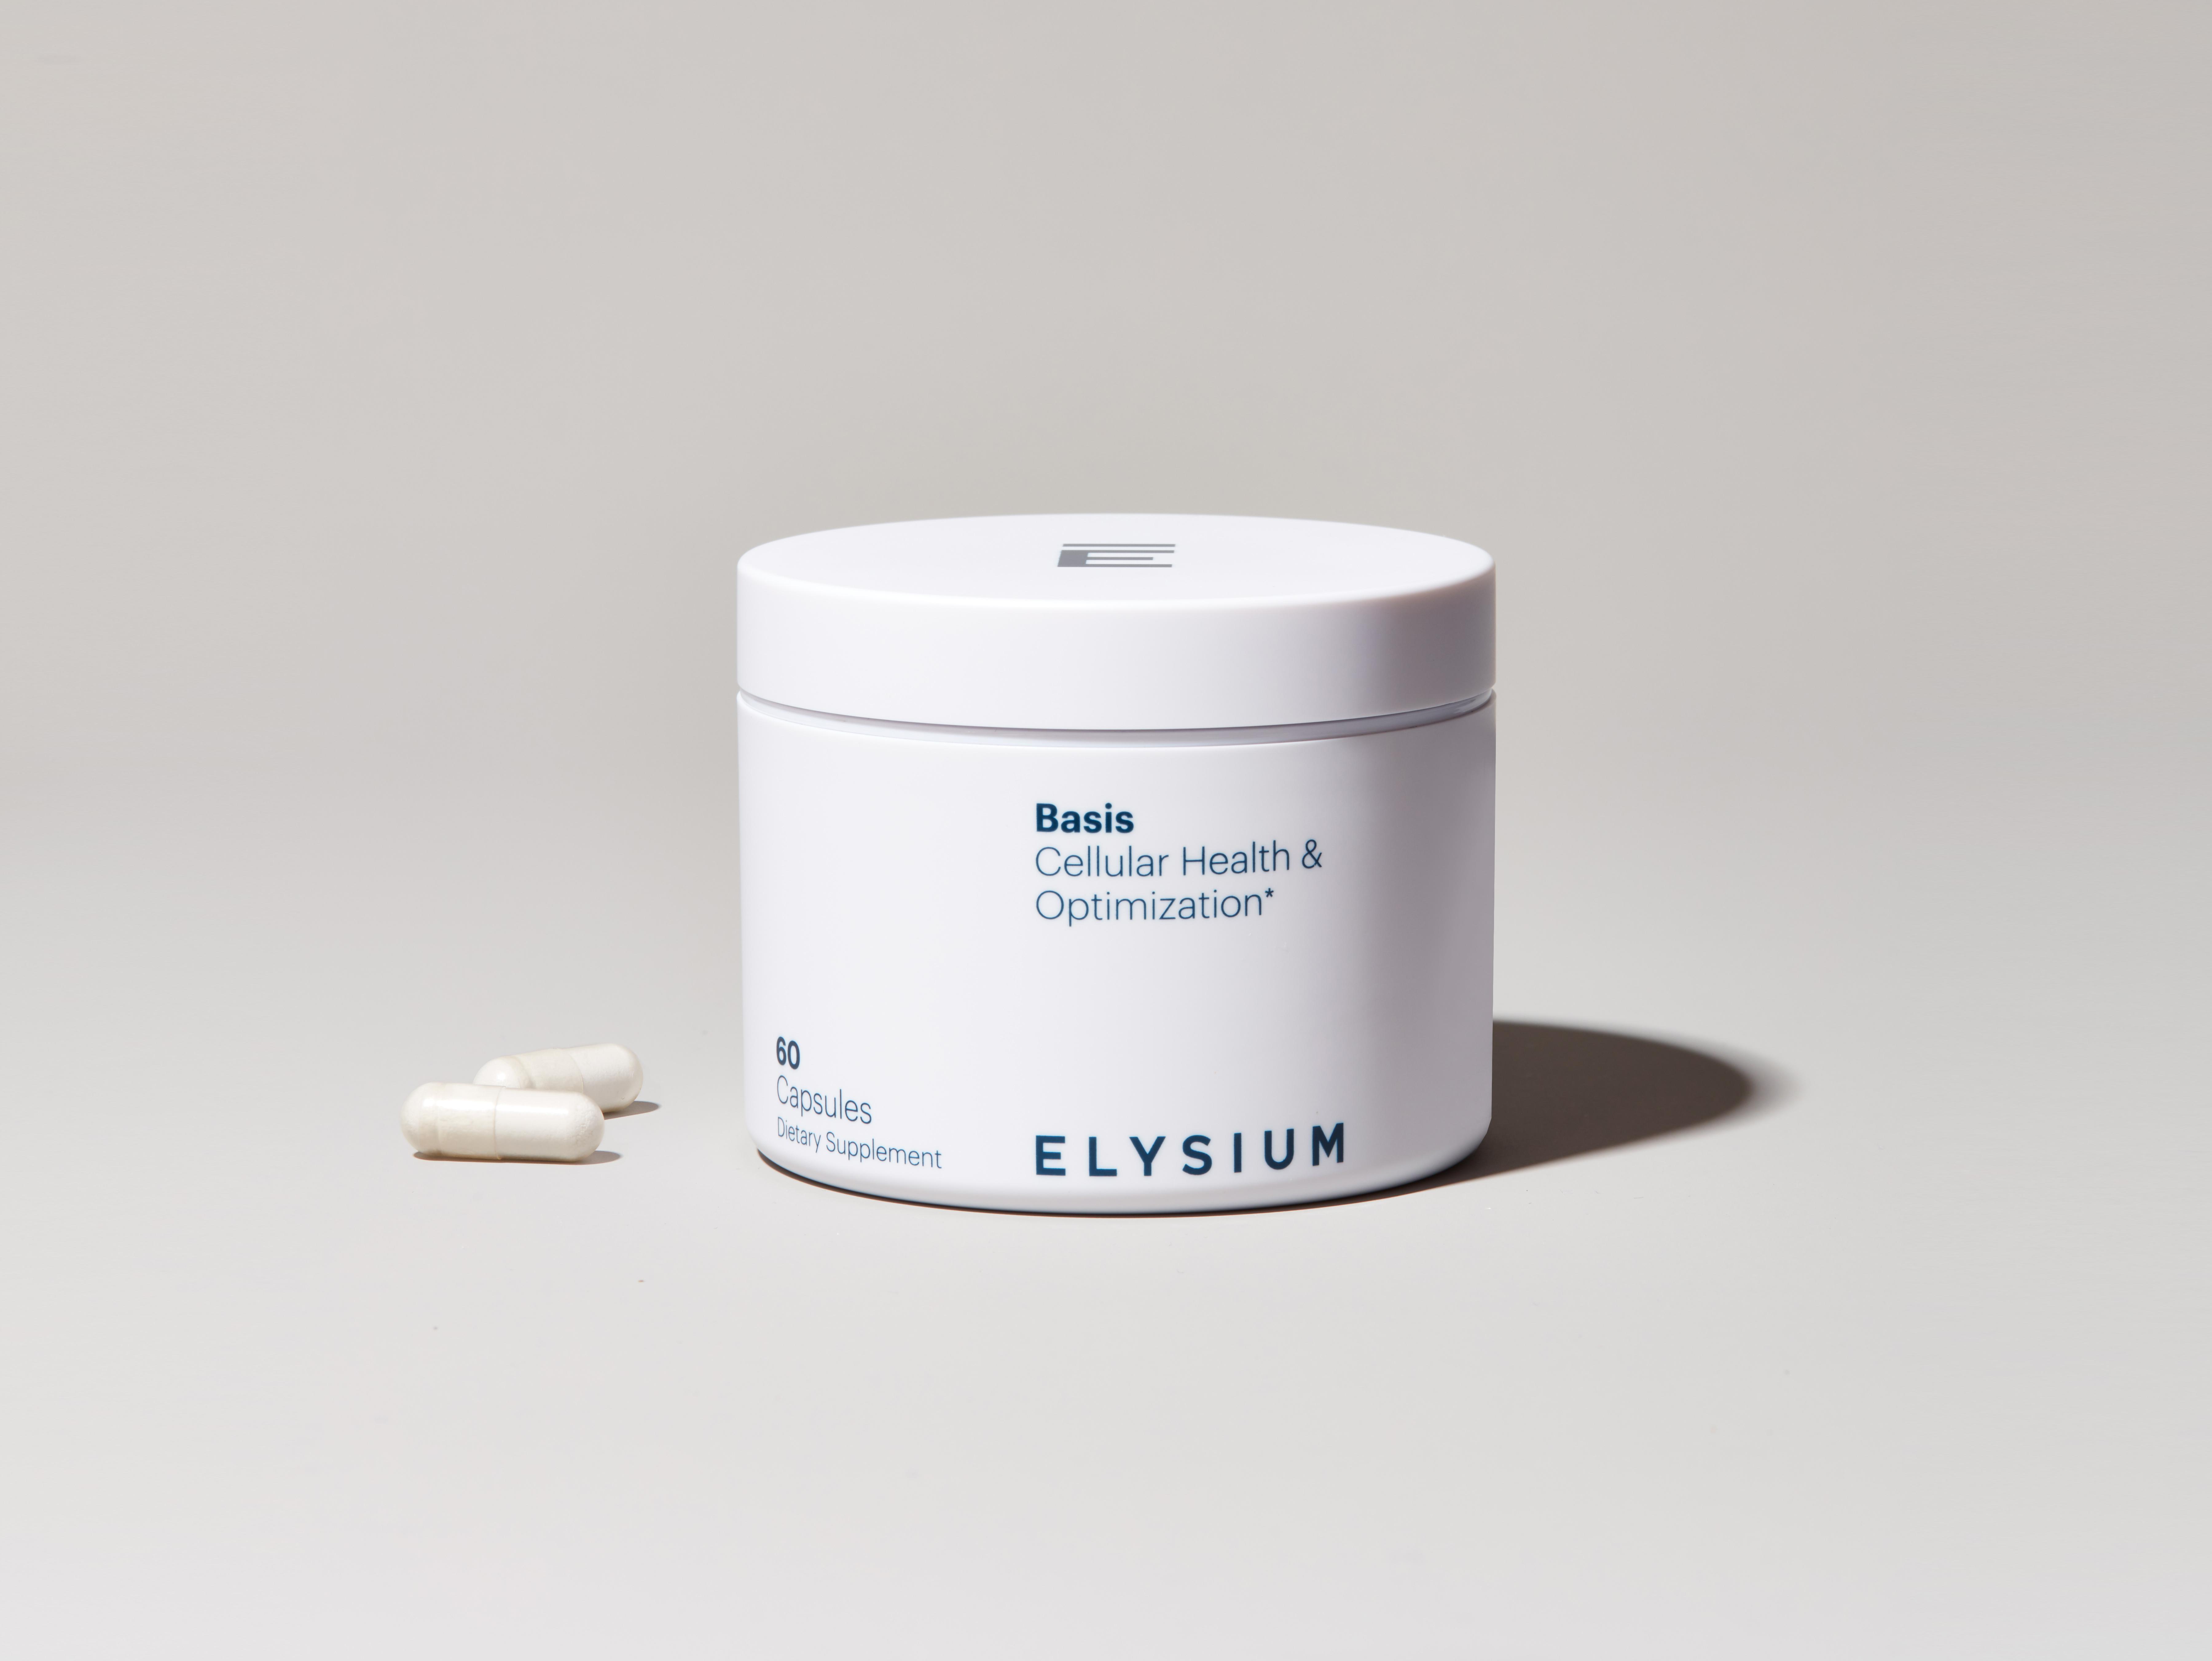 elysium basis supplement - HD7200×5408